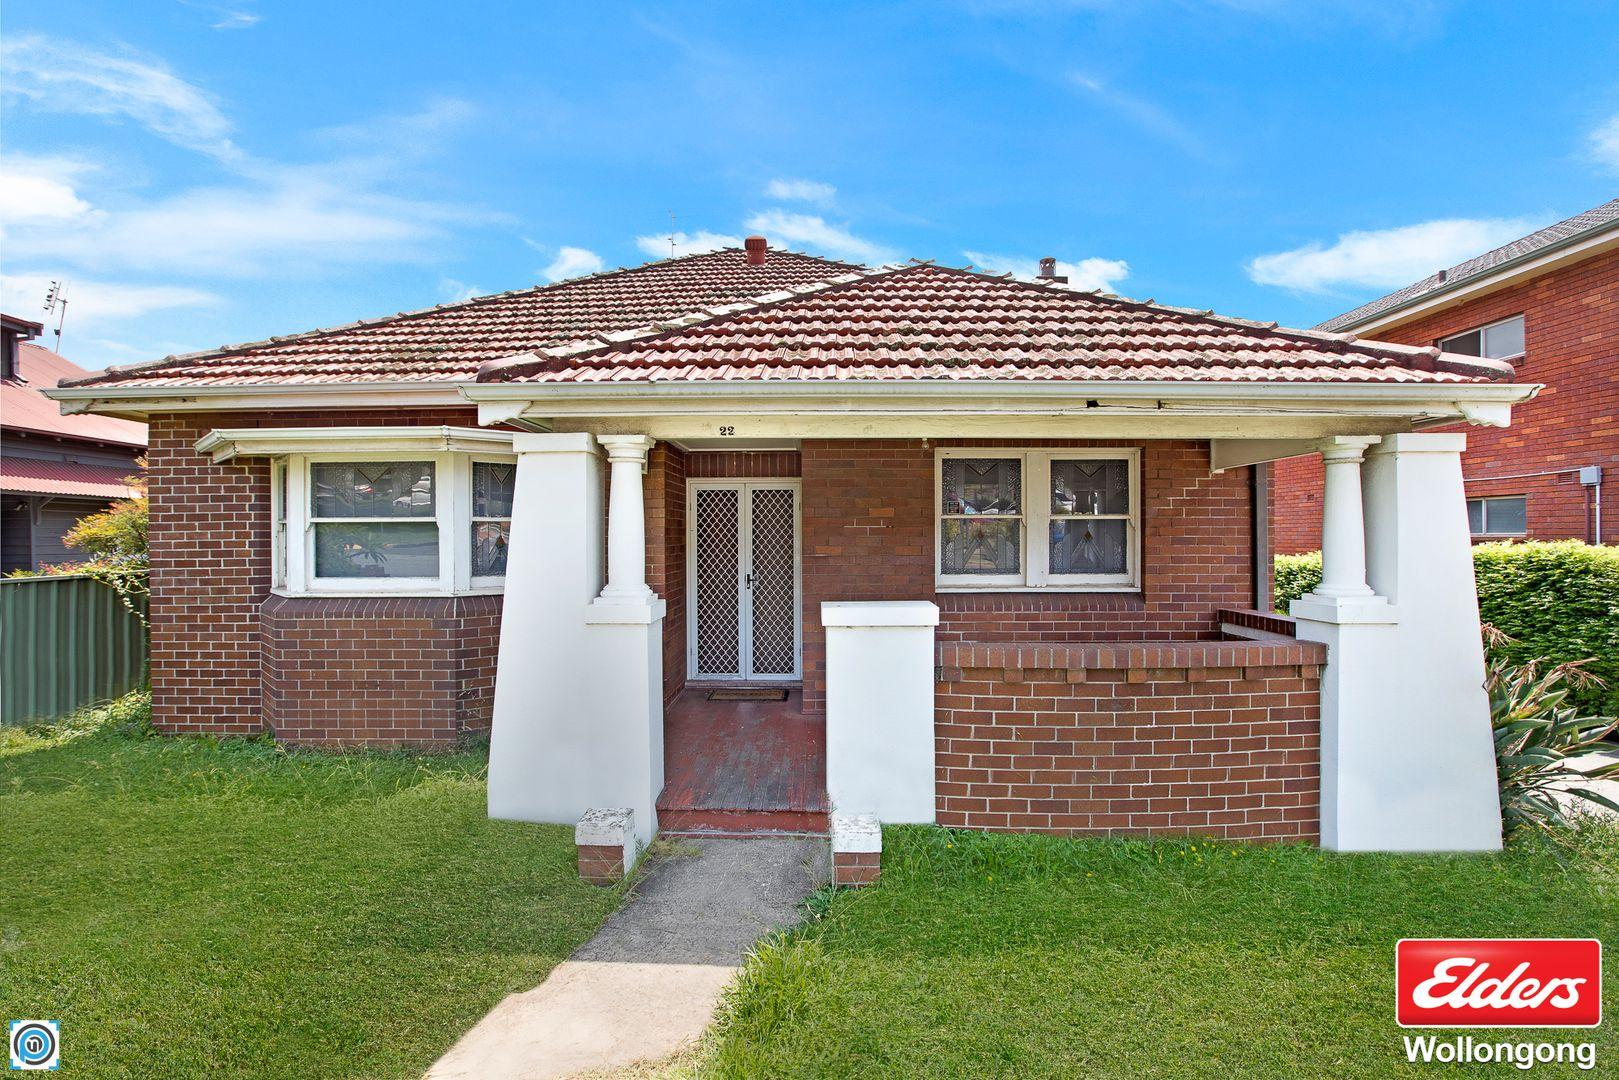 1/22 Rowland Avenue, Wollongong NSW 2500, Image 1